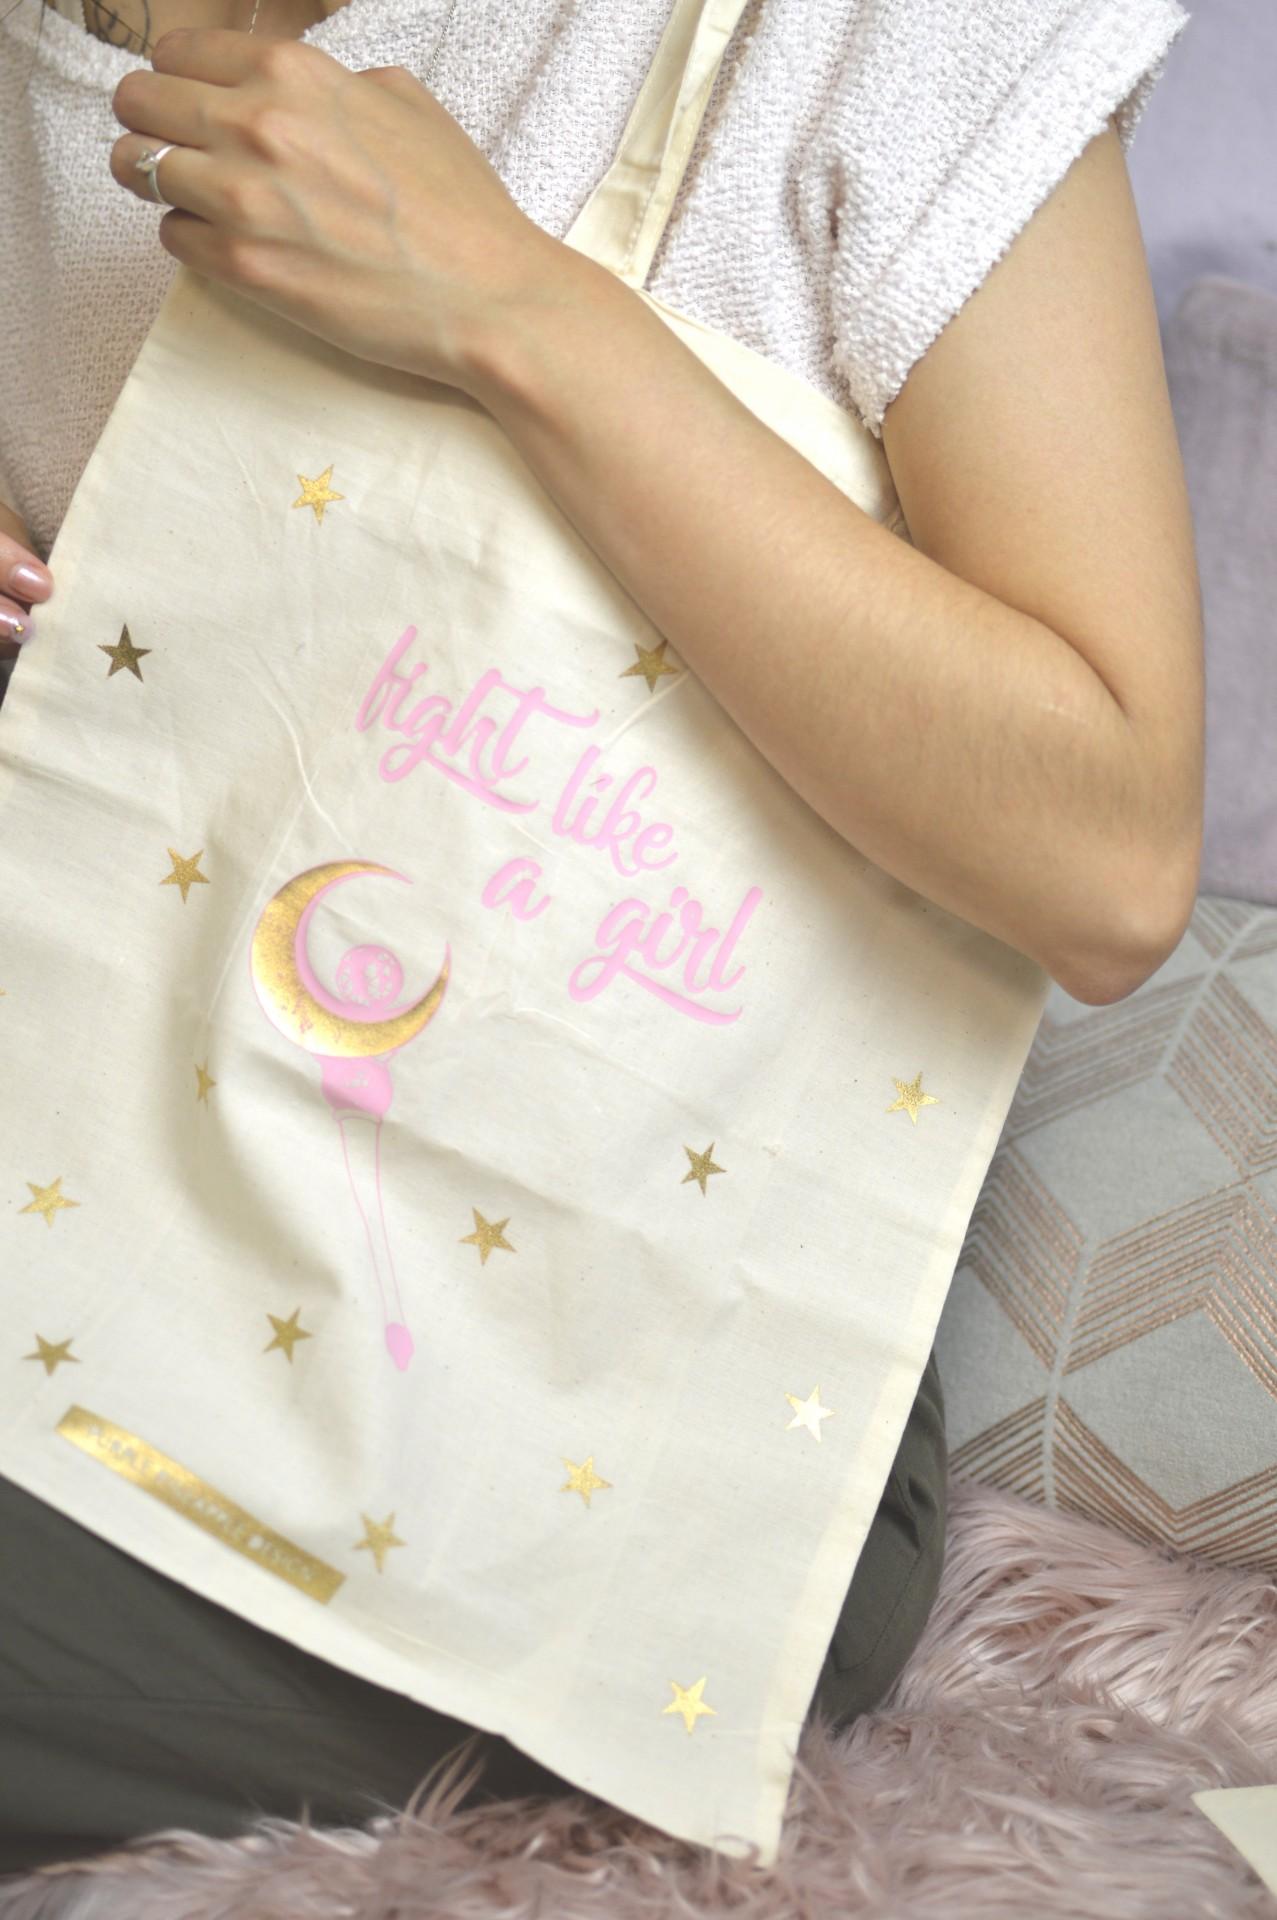 Tote Bag ☾ Fight like a girl ☽